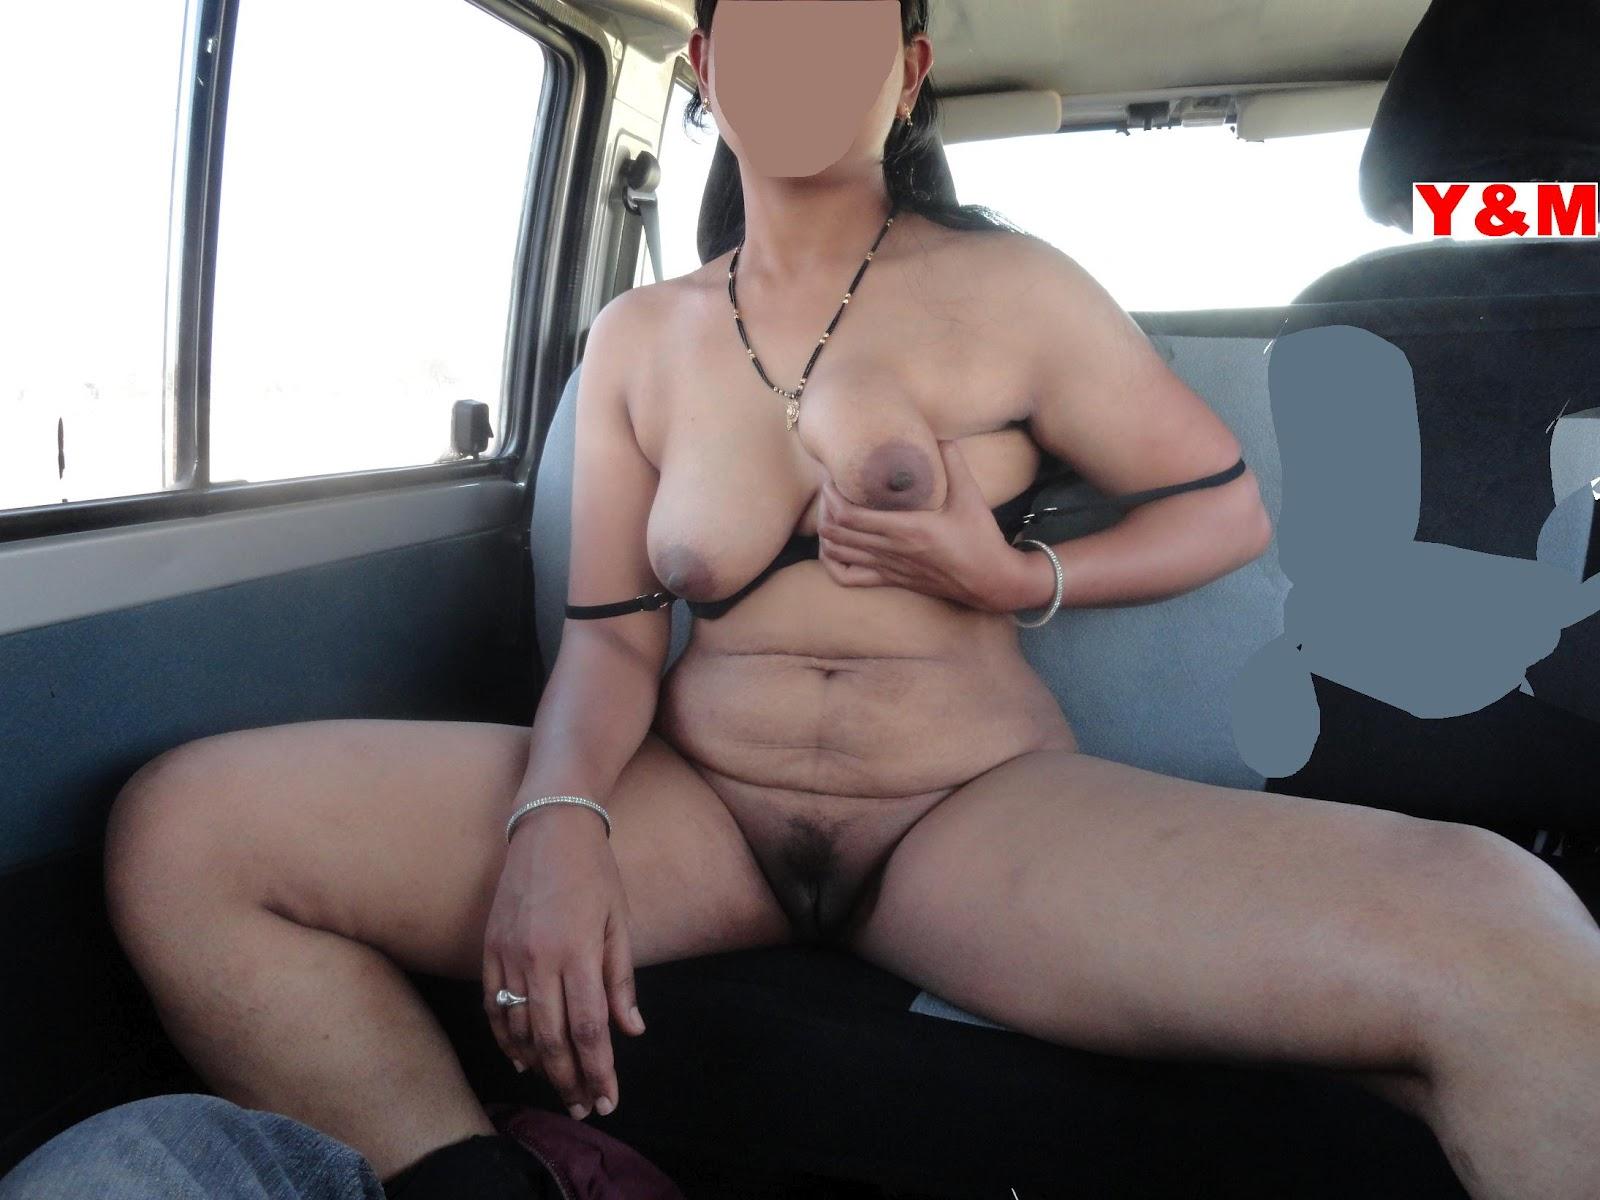 sexy bikini porn videos torrent